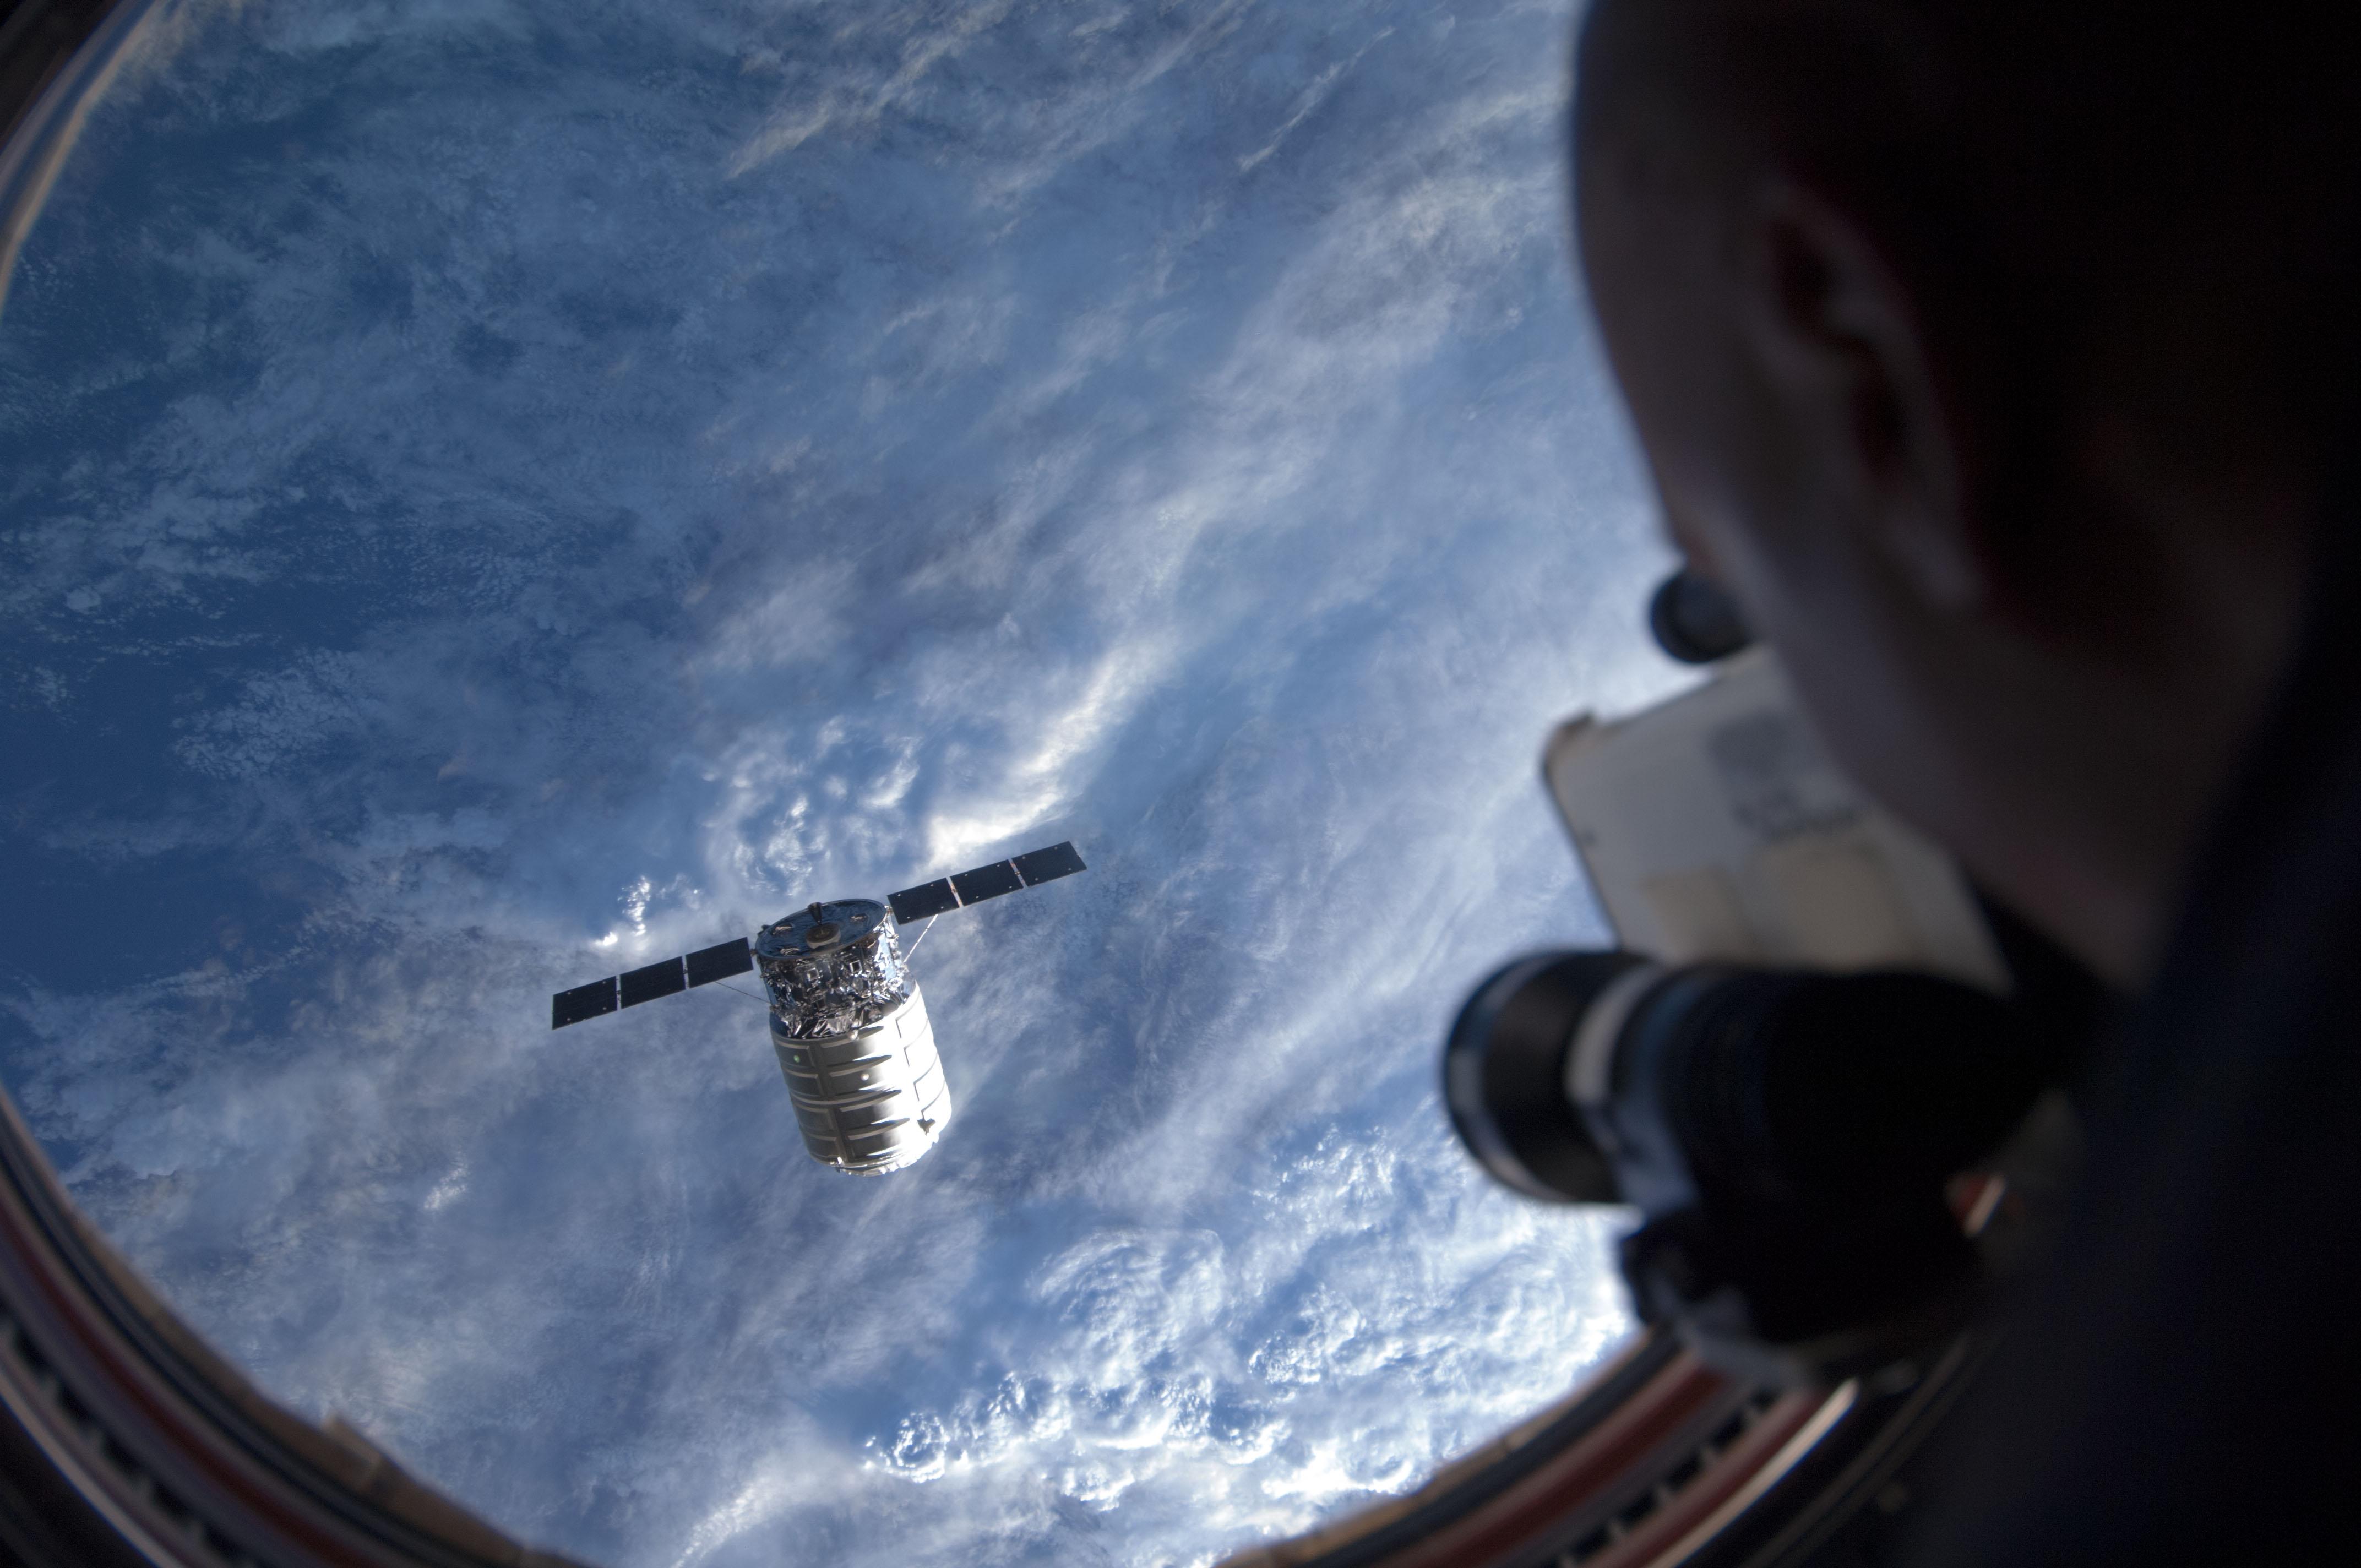 european space agency astronaut jobs - photo #28